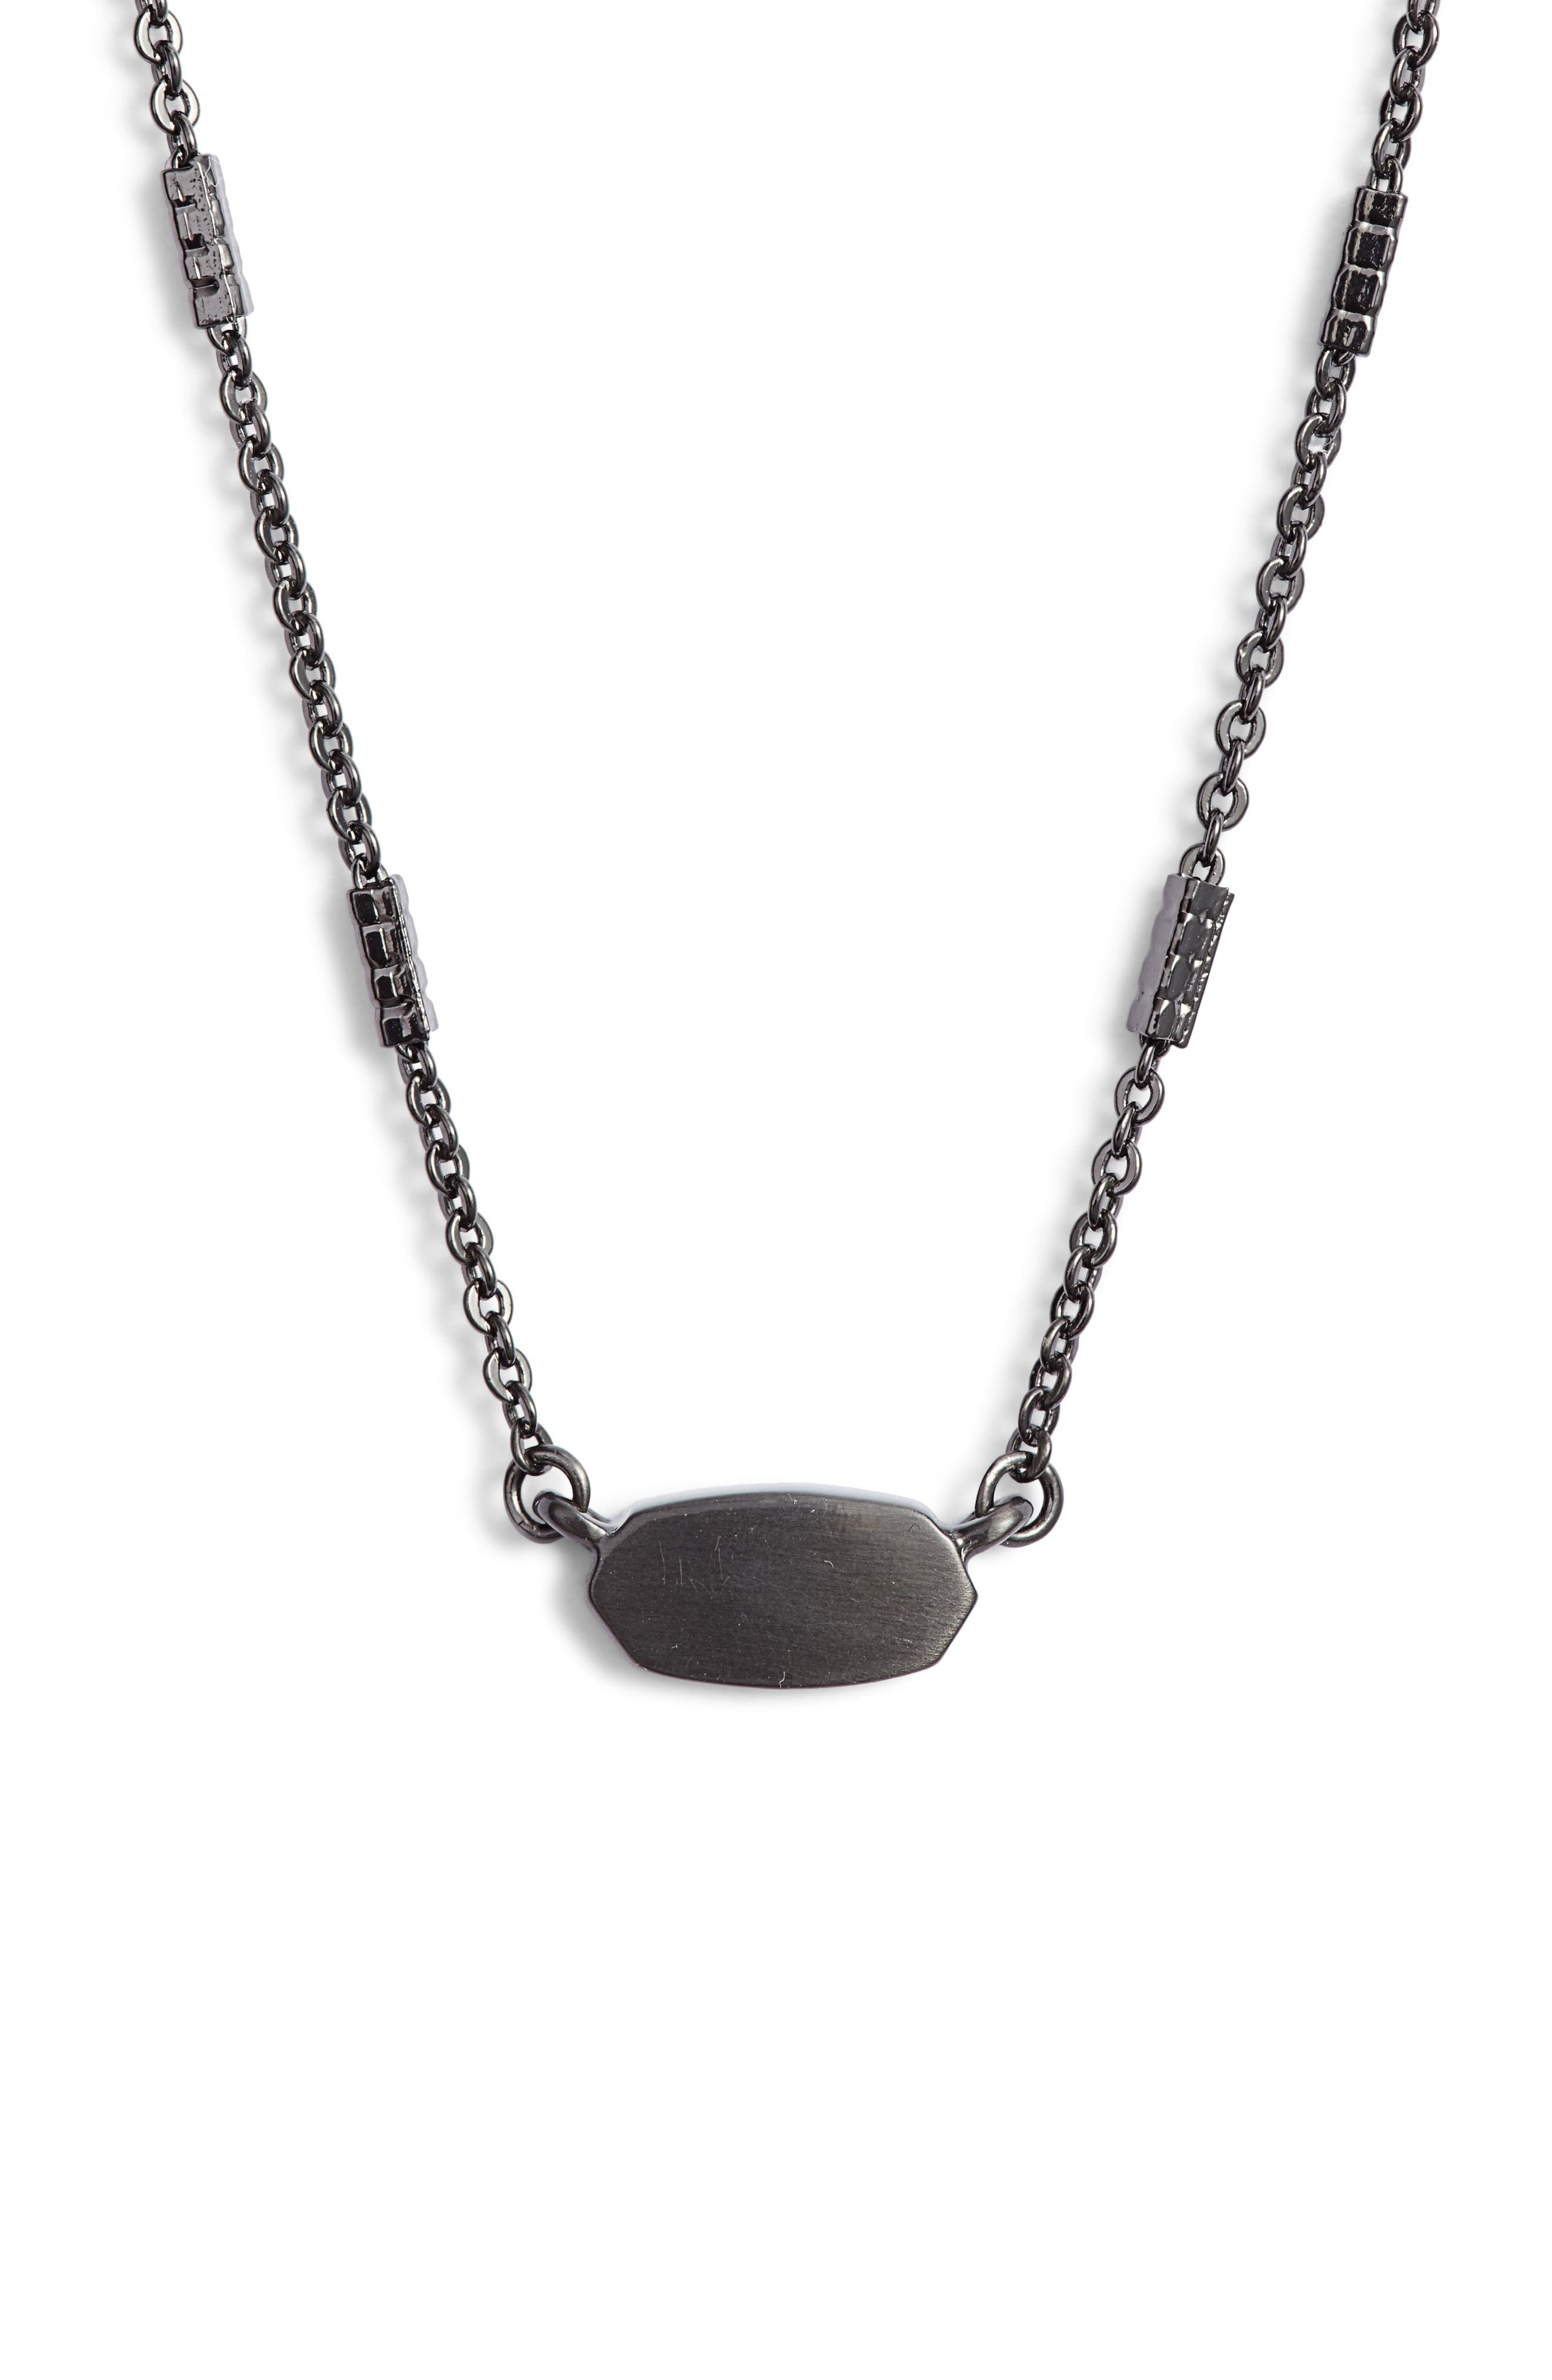 KENDRA SCOTT Fern Pendant Necklace, Main, color, GUNMETAL